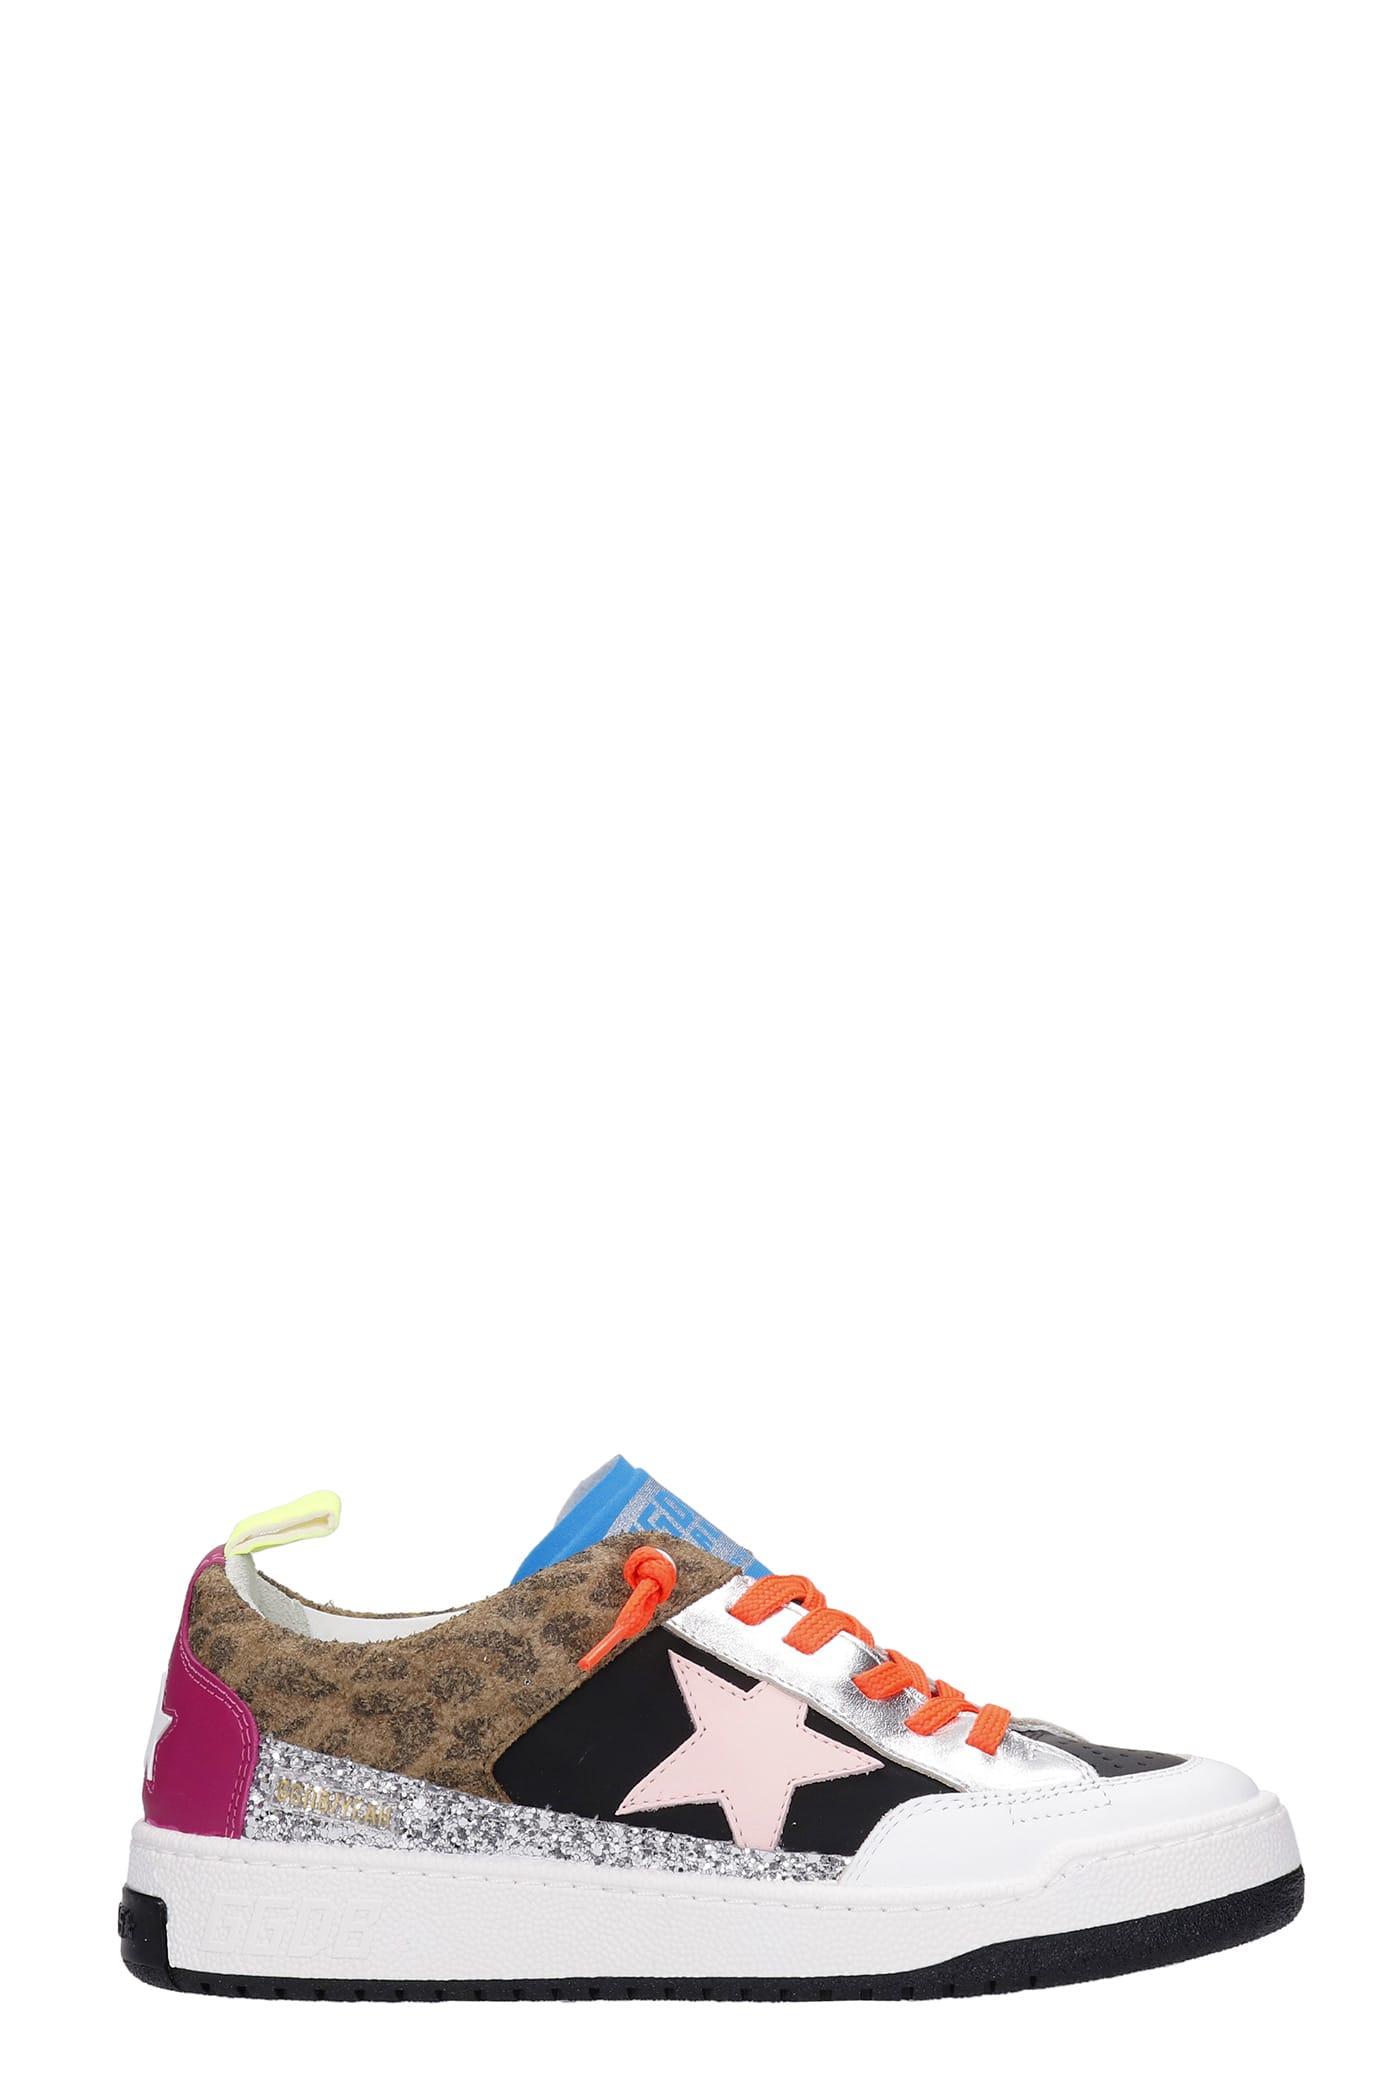 Golden Goose Yeah Sneakers In Multicolor Synthetic Fibers